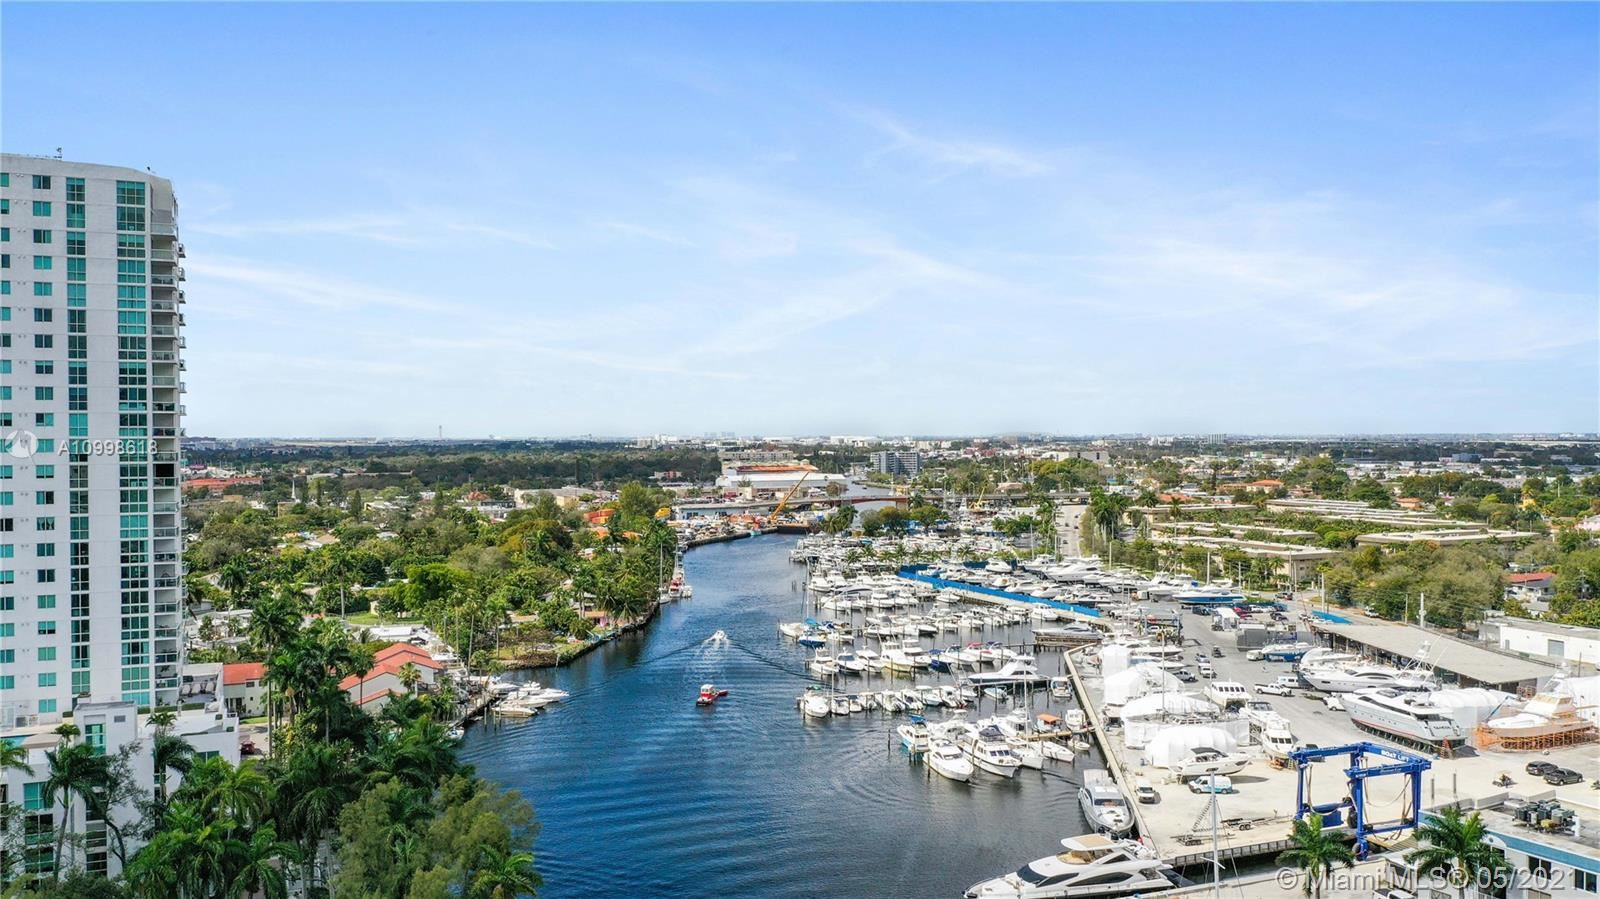 1861 NW South River Dr #1208, Miami, FL 33125 - #: A10998618